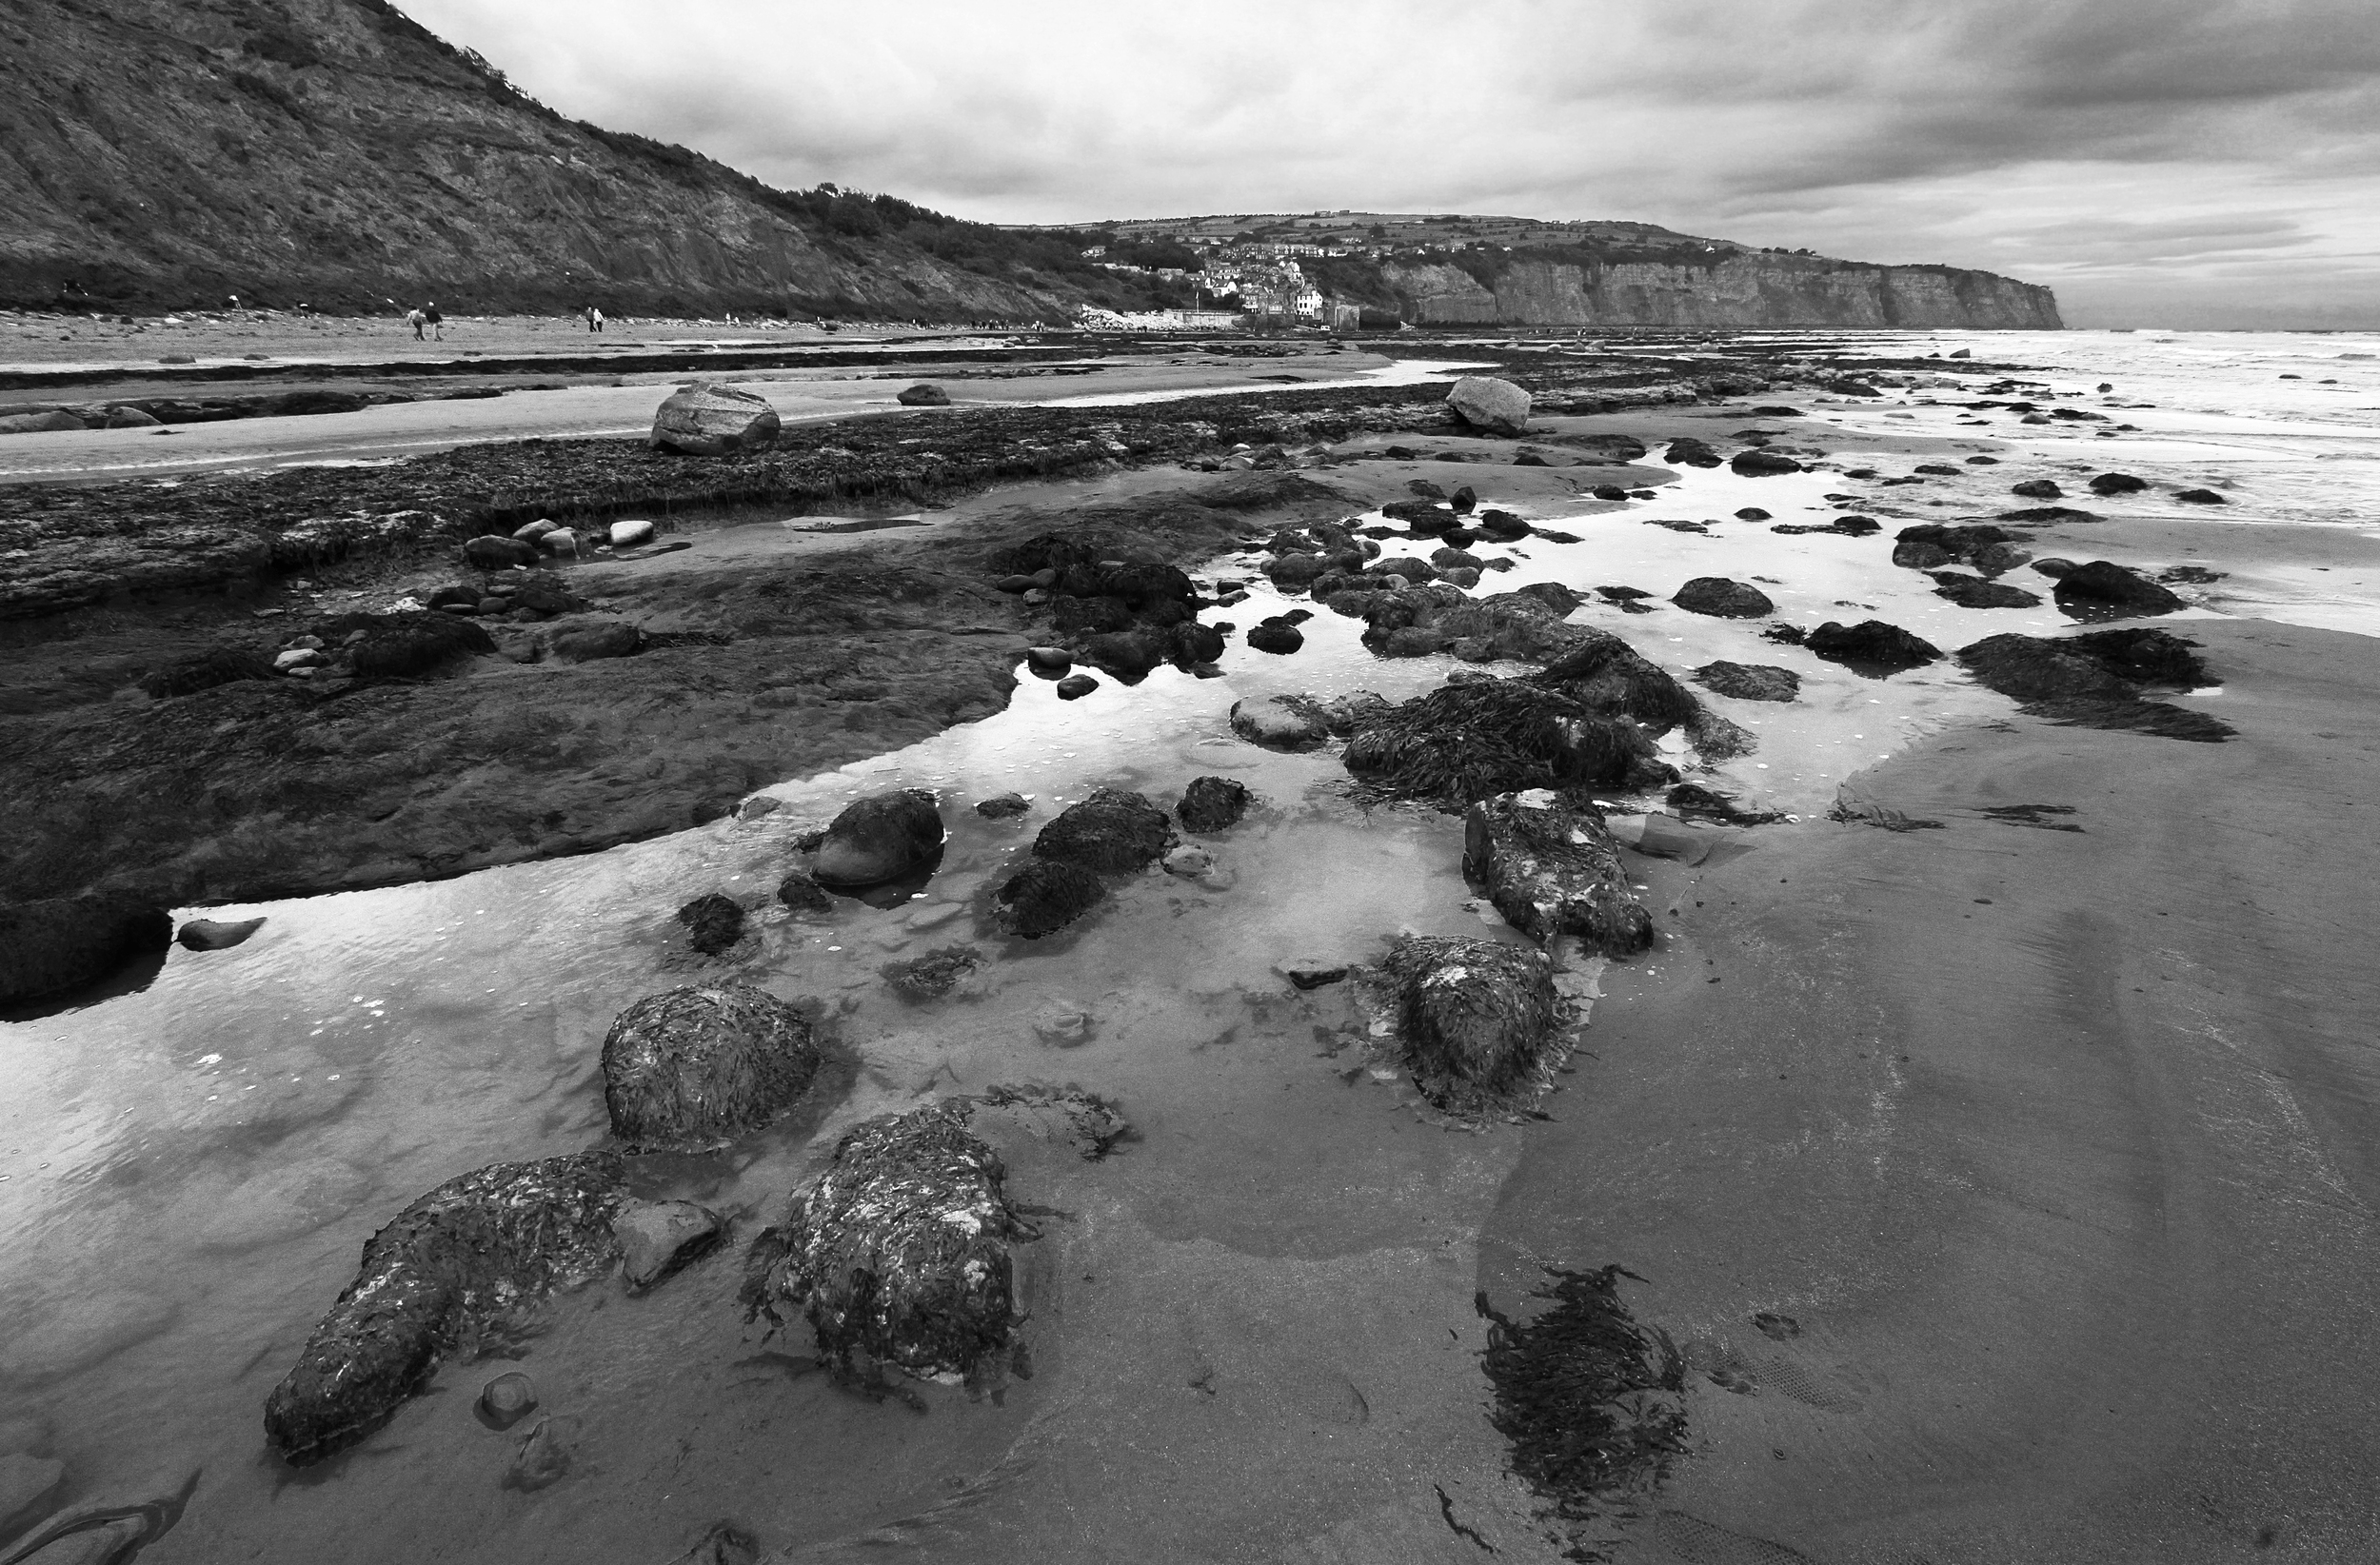 Monochrome Bay